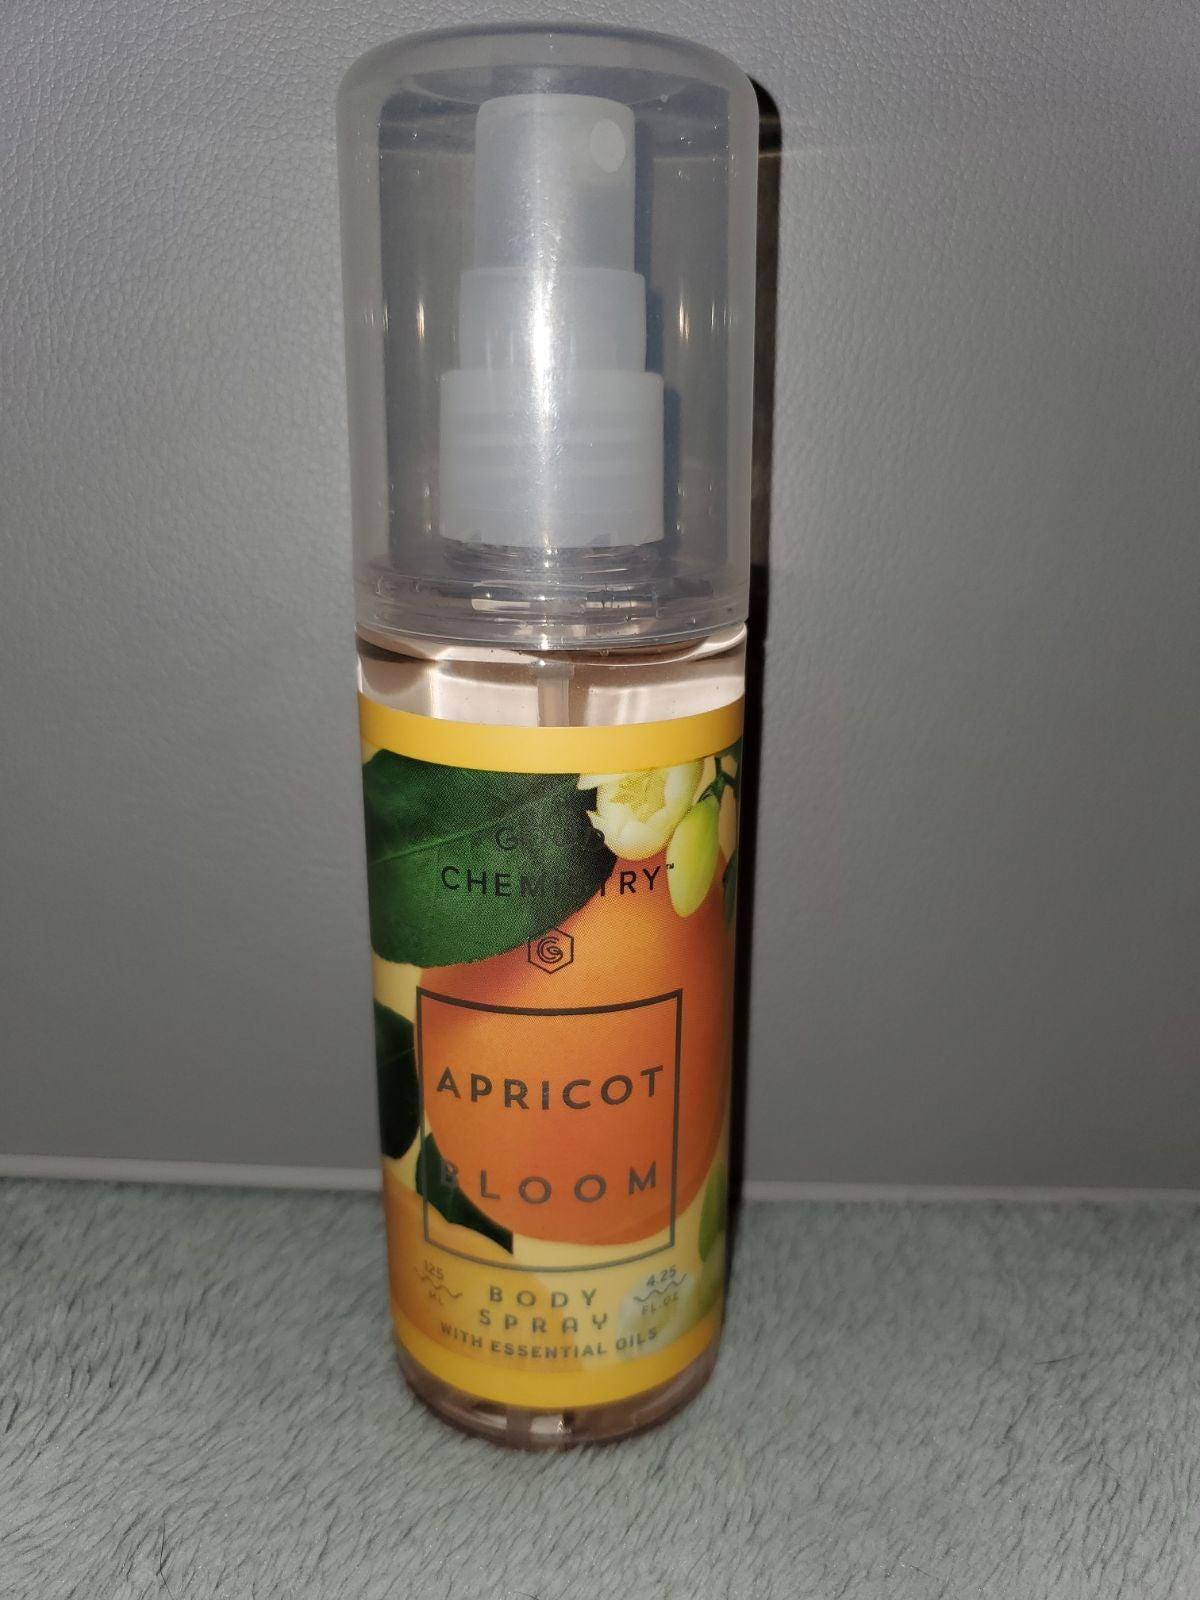 Good chemistry apricot bloom body spray